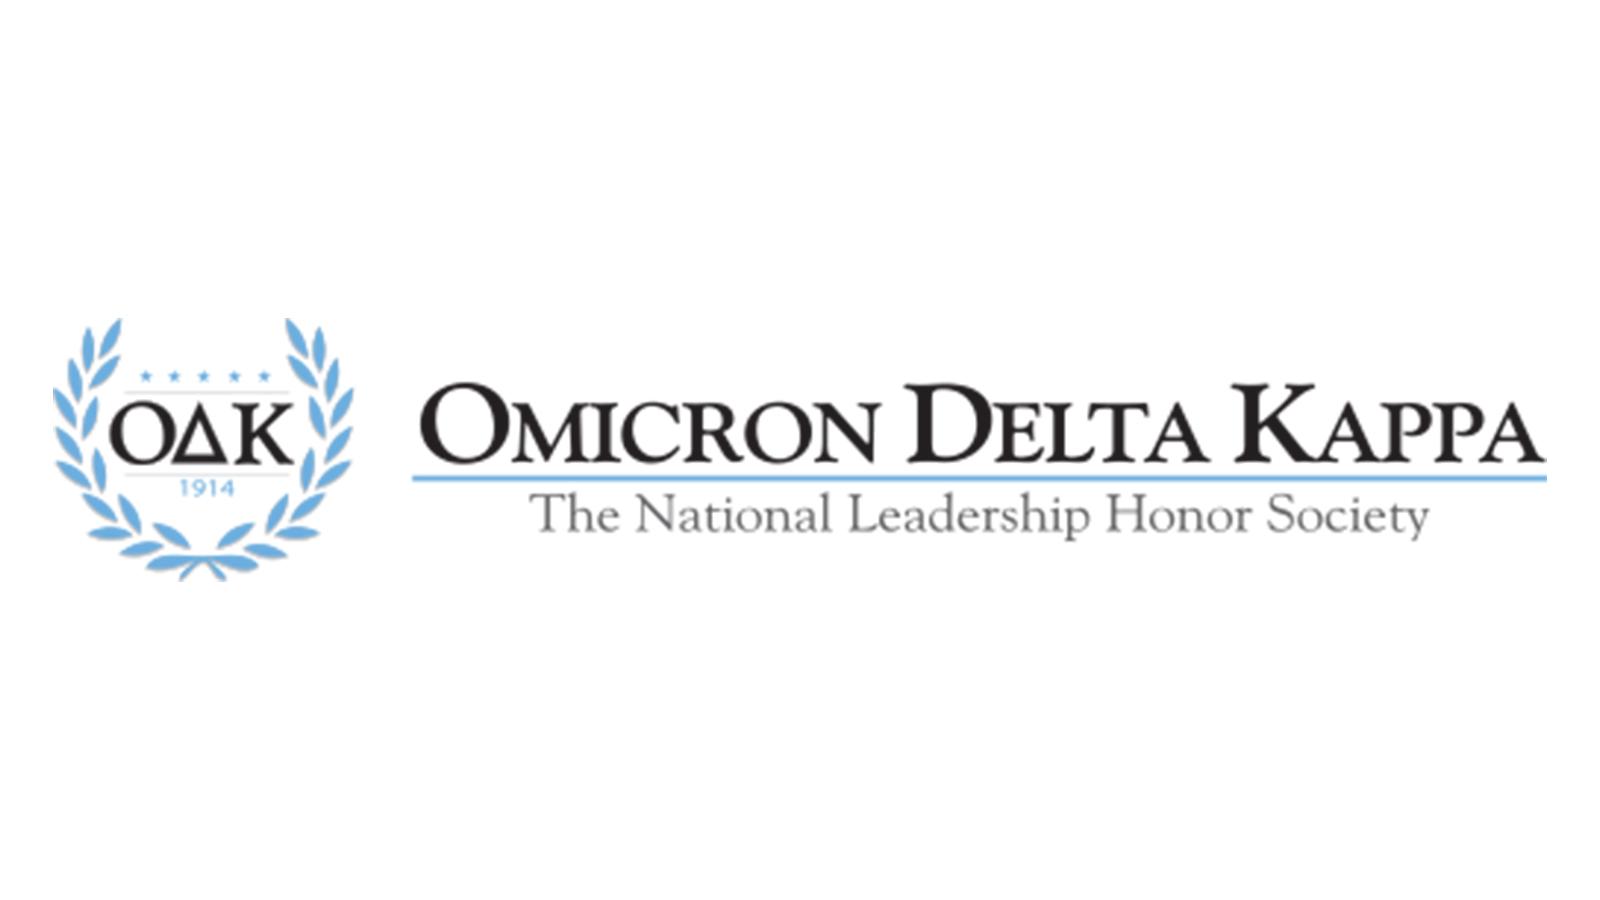 Logo for Omicron Delta Kappa